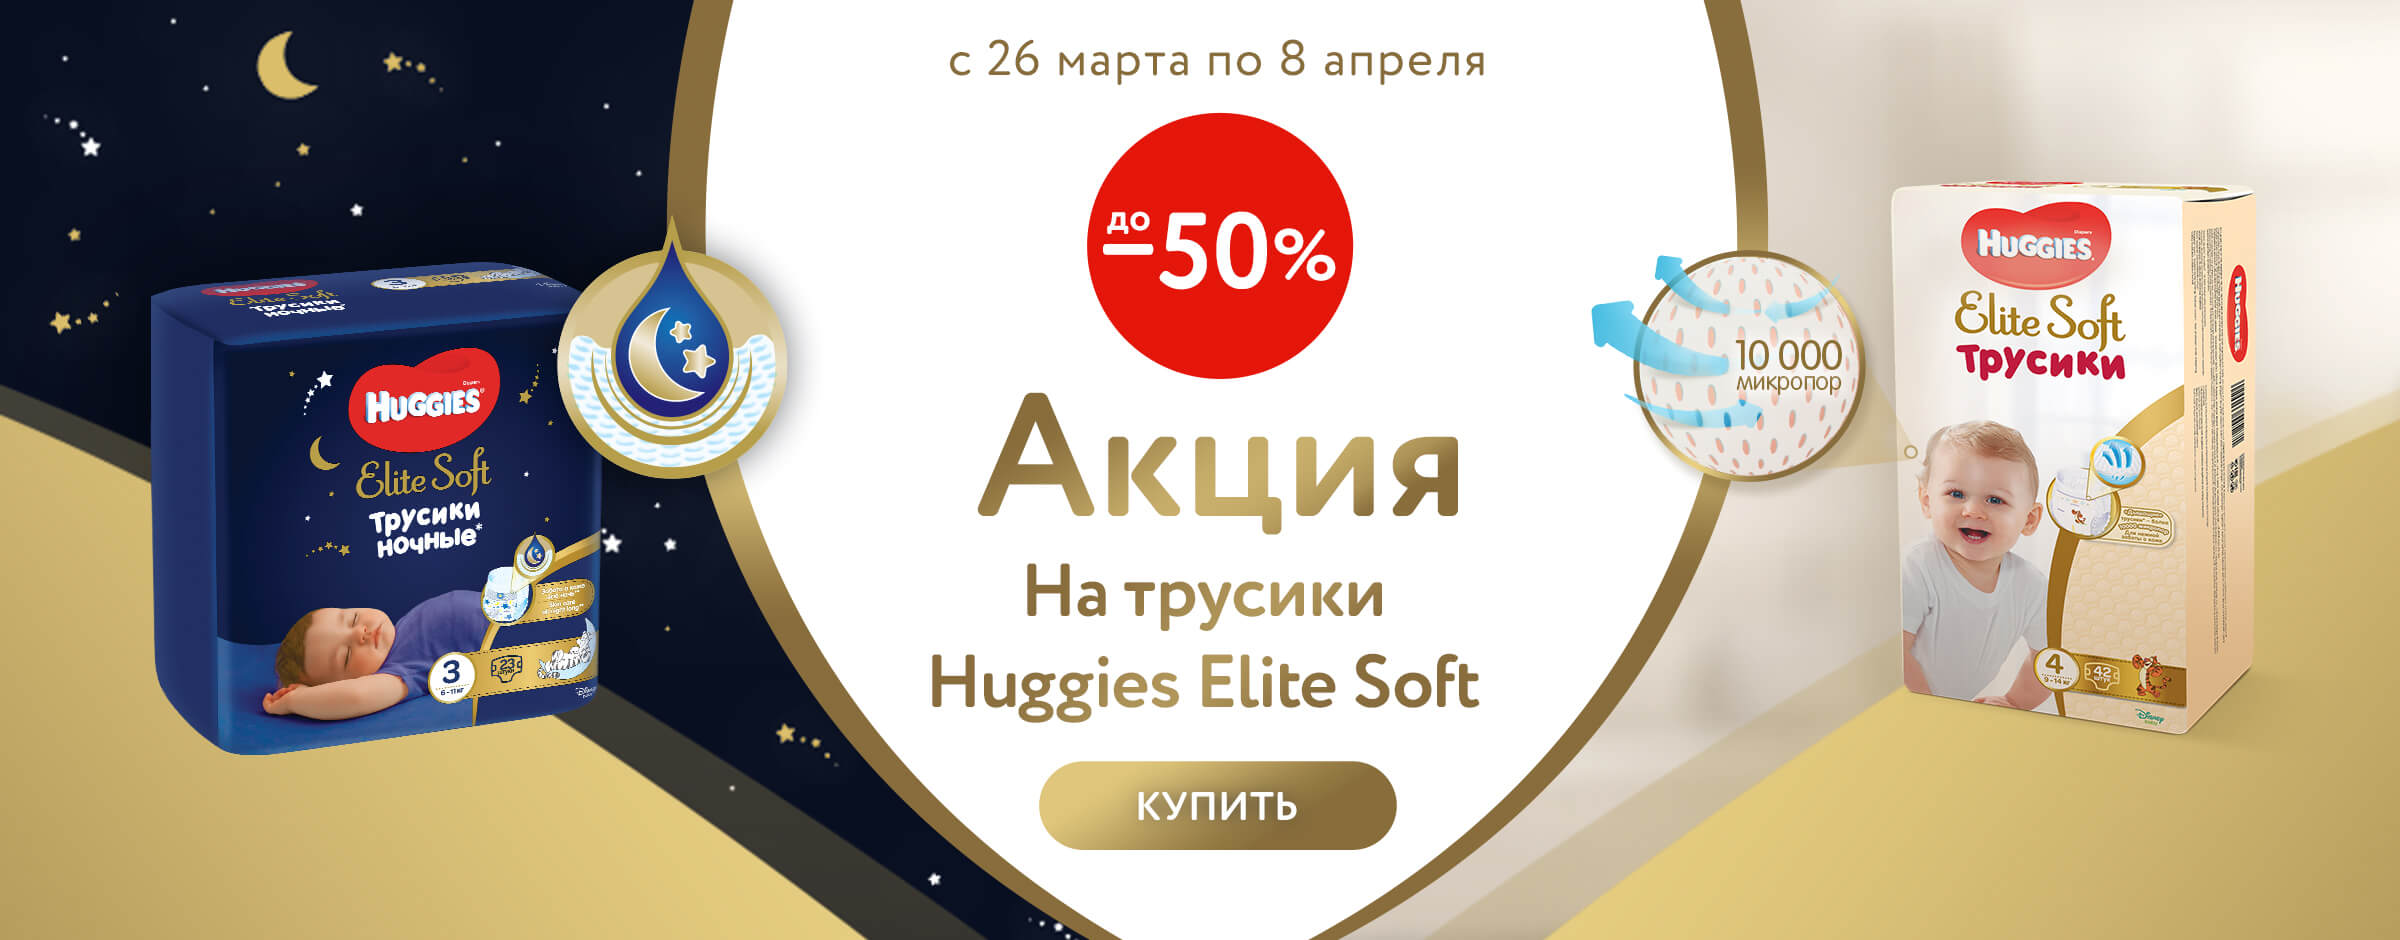 До 50% на трусики Huggies Elite soft Трусики